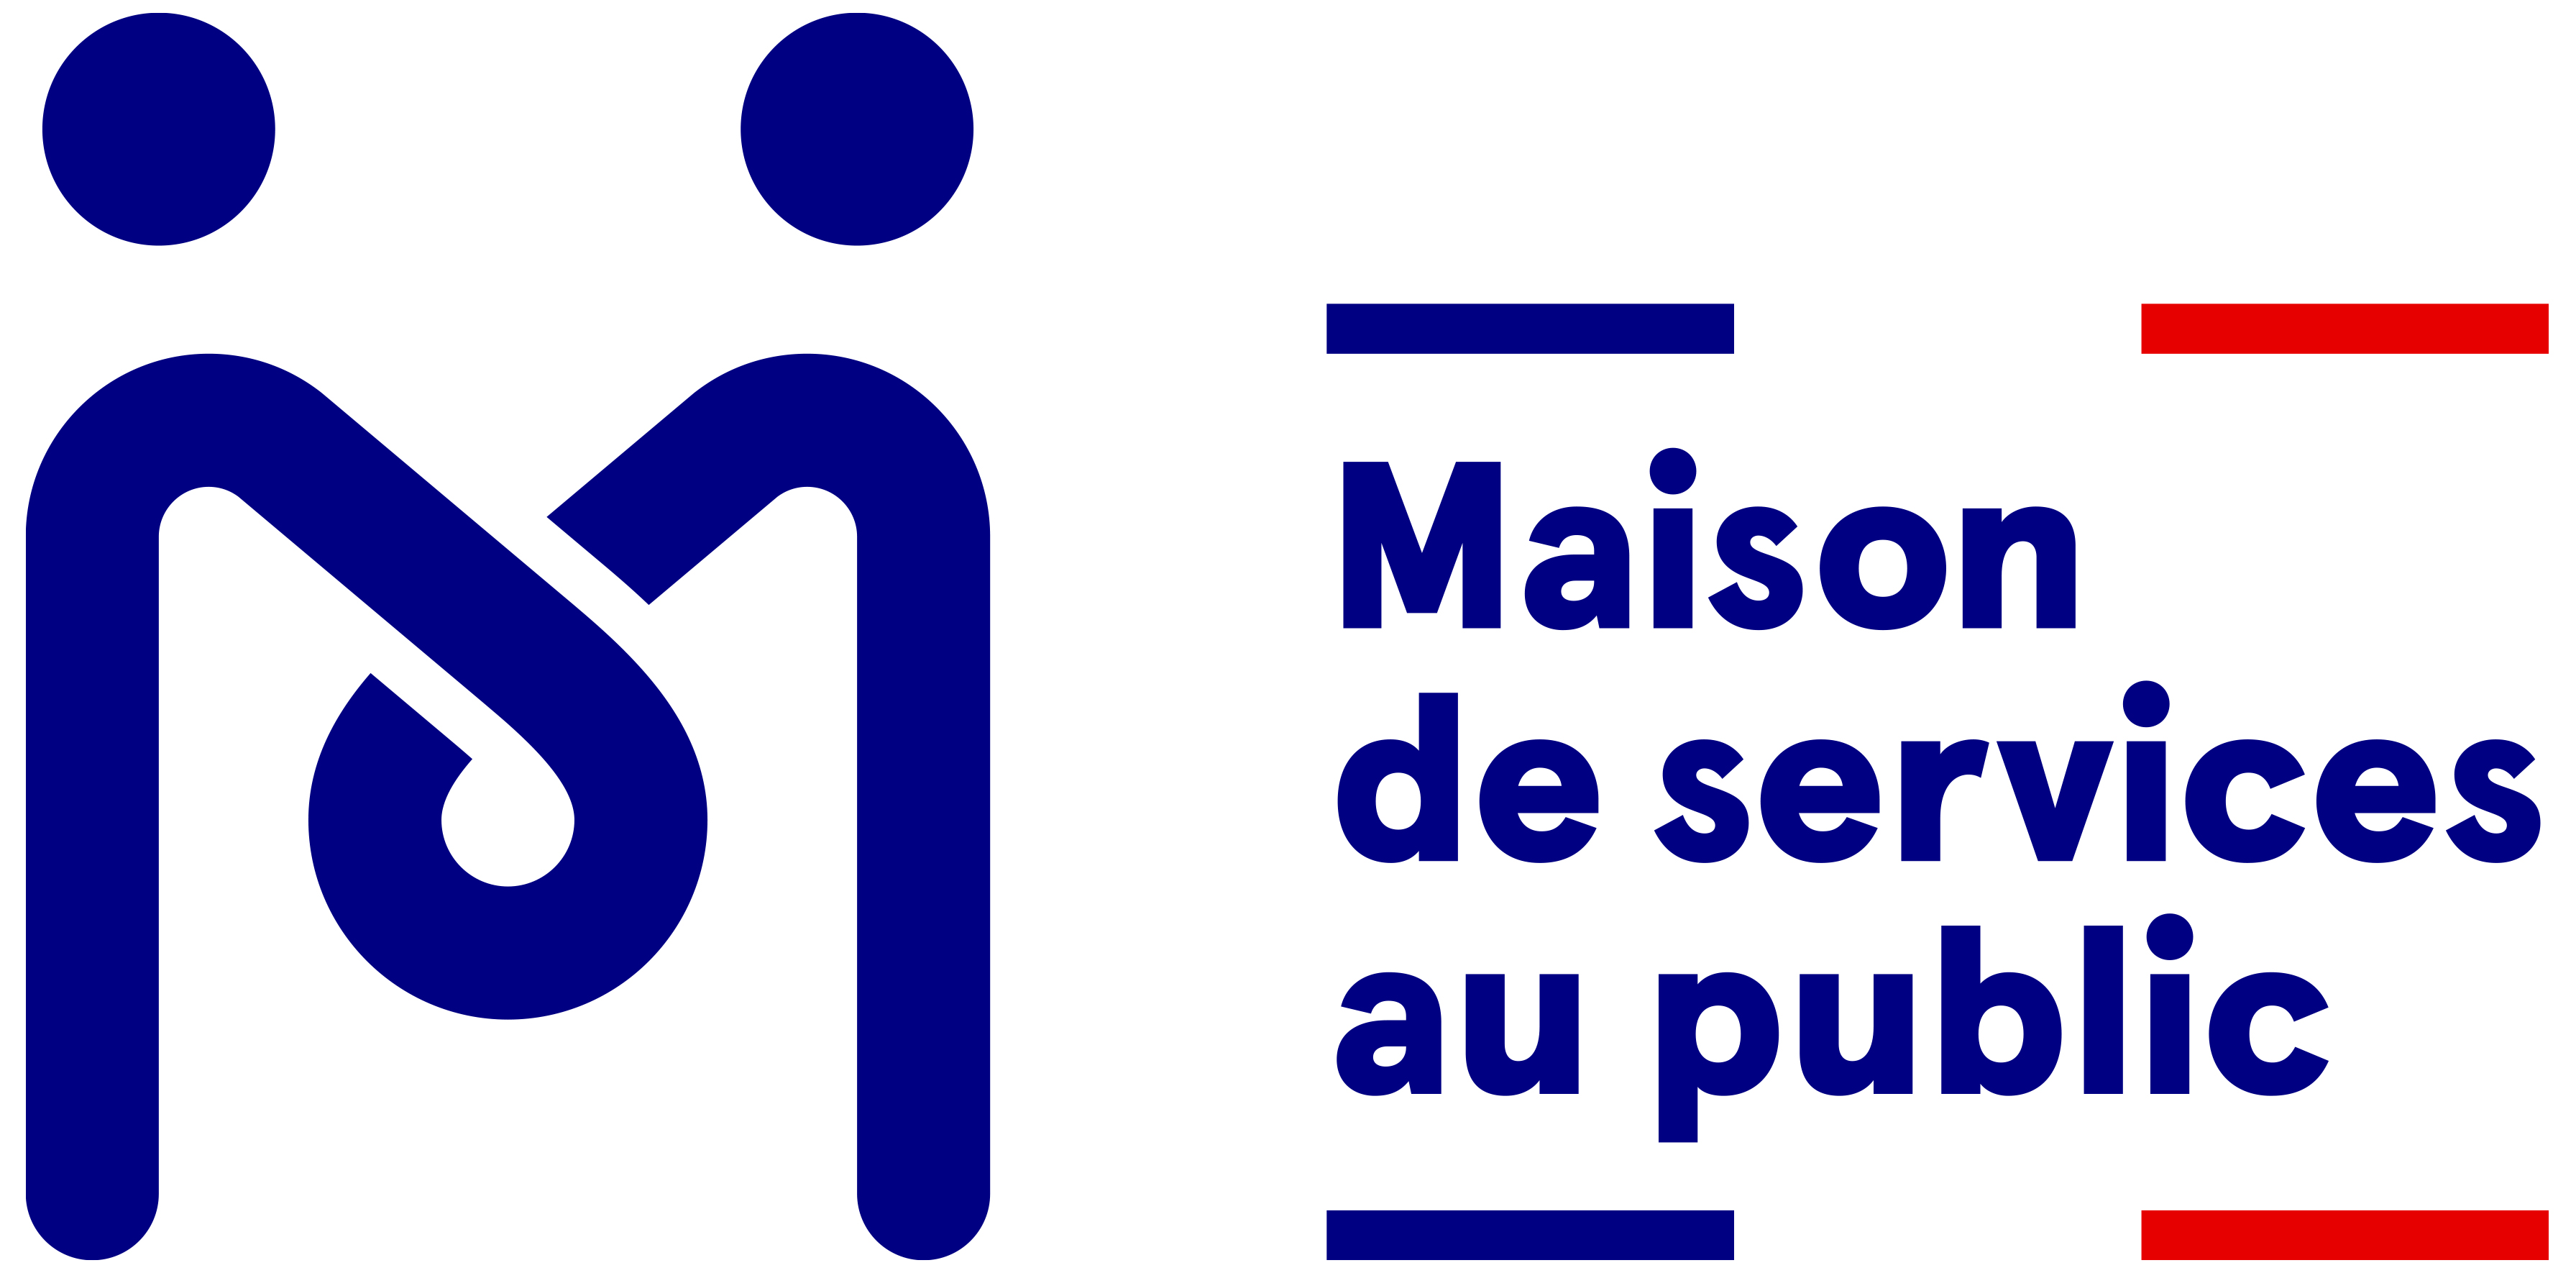 msap-logo-hl-rvb